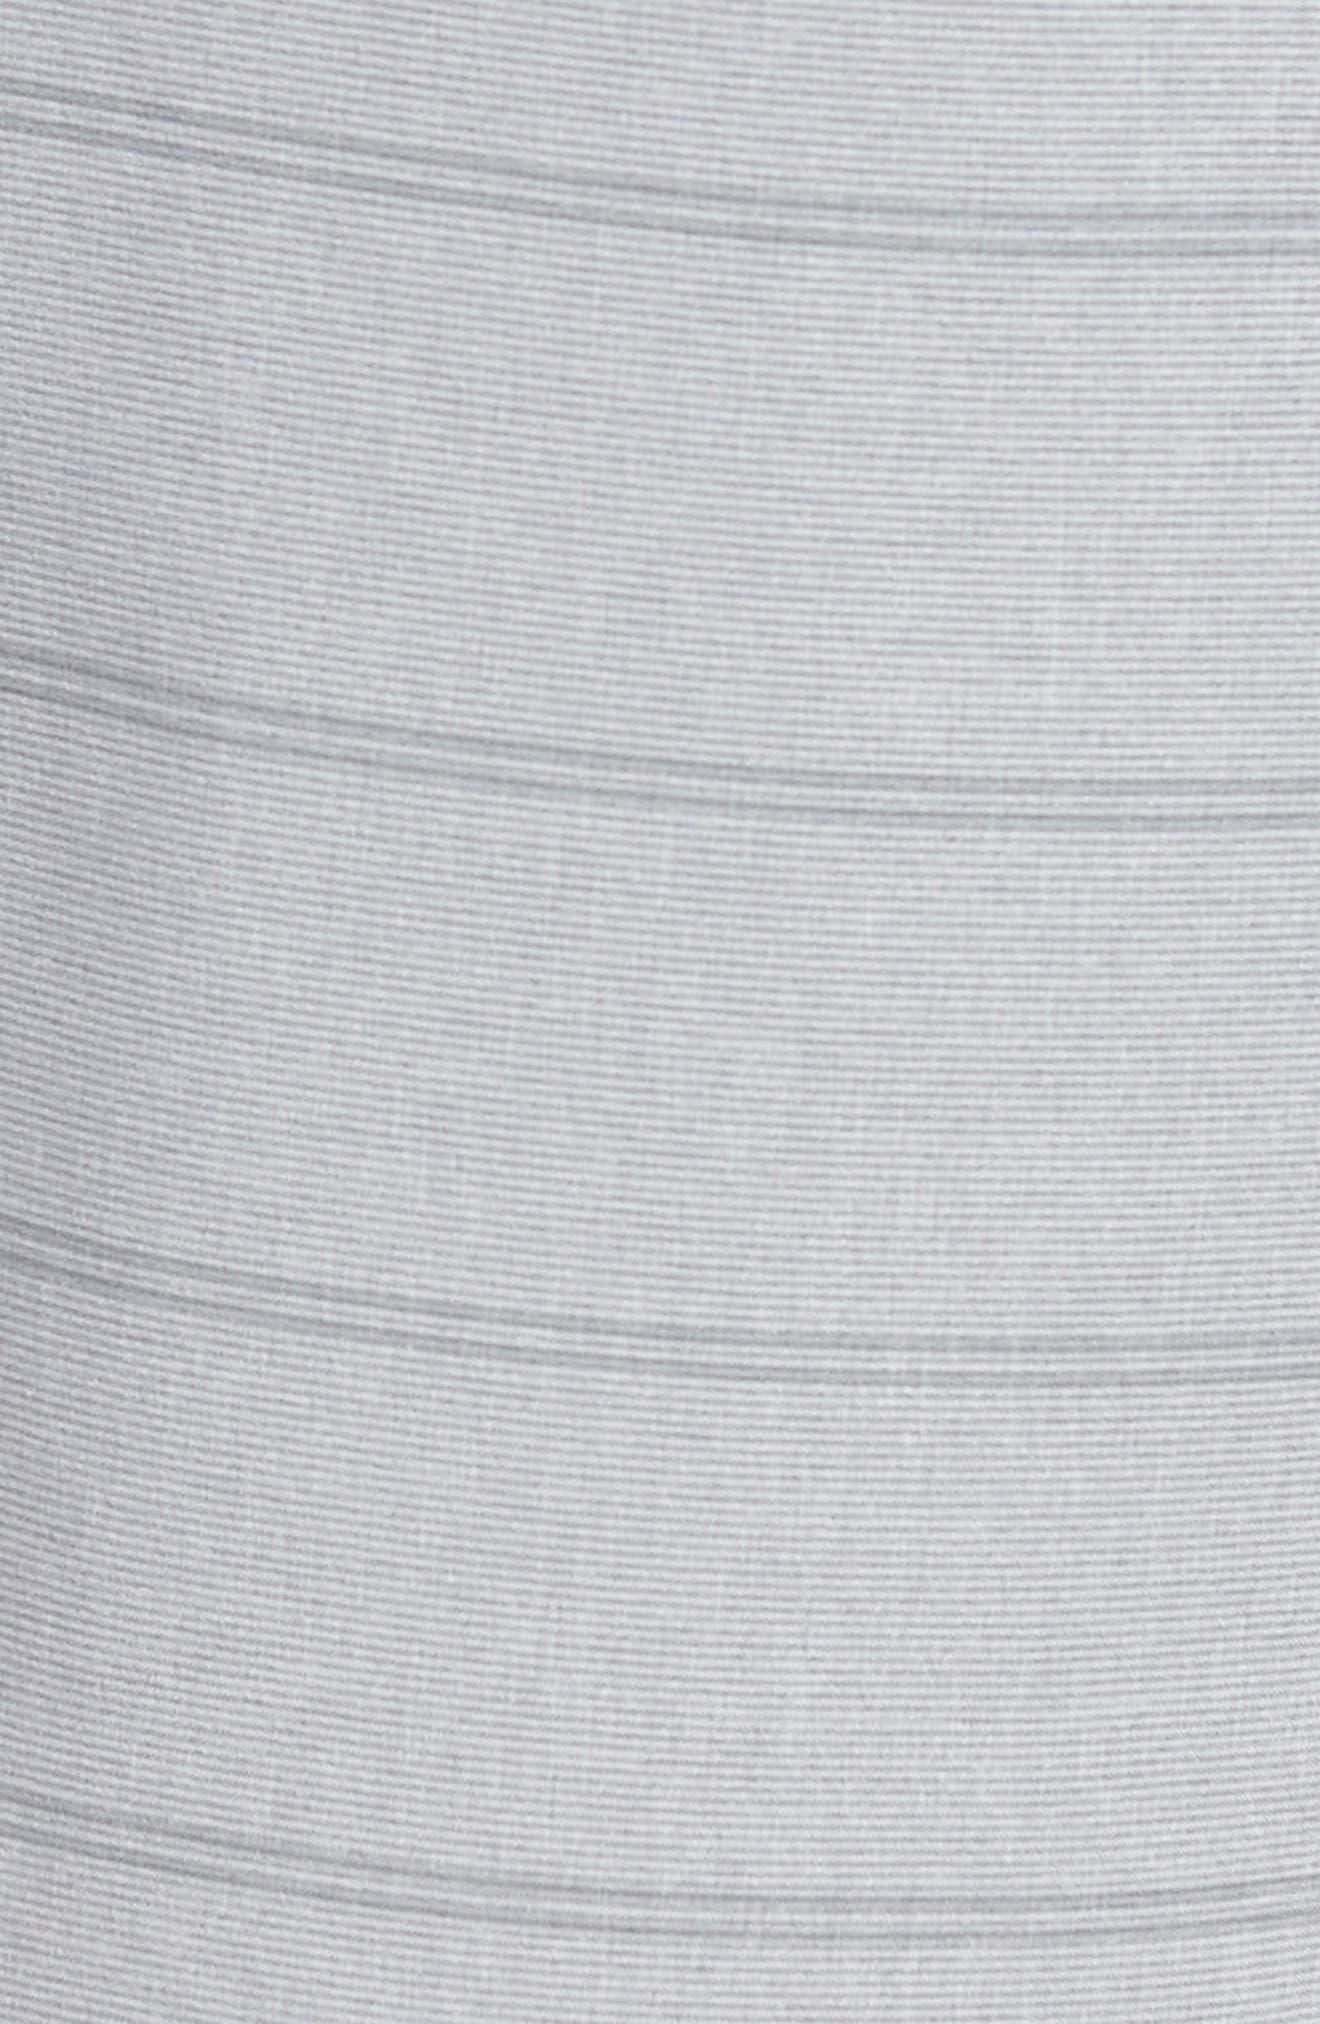 Suva Amphibian Hybrid Shorts,                             Alternate thumbnail 5, color,                             STEEPLE GRAY